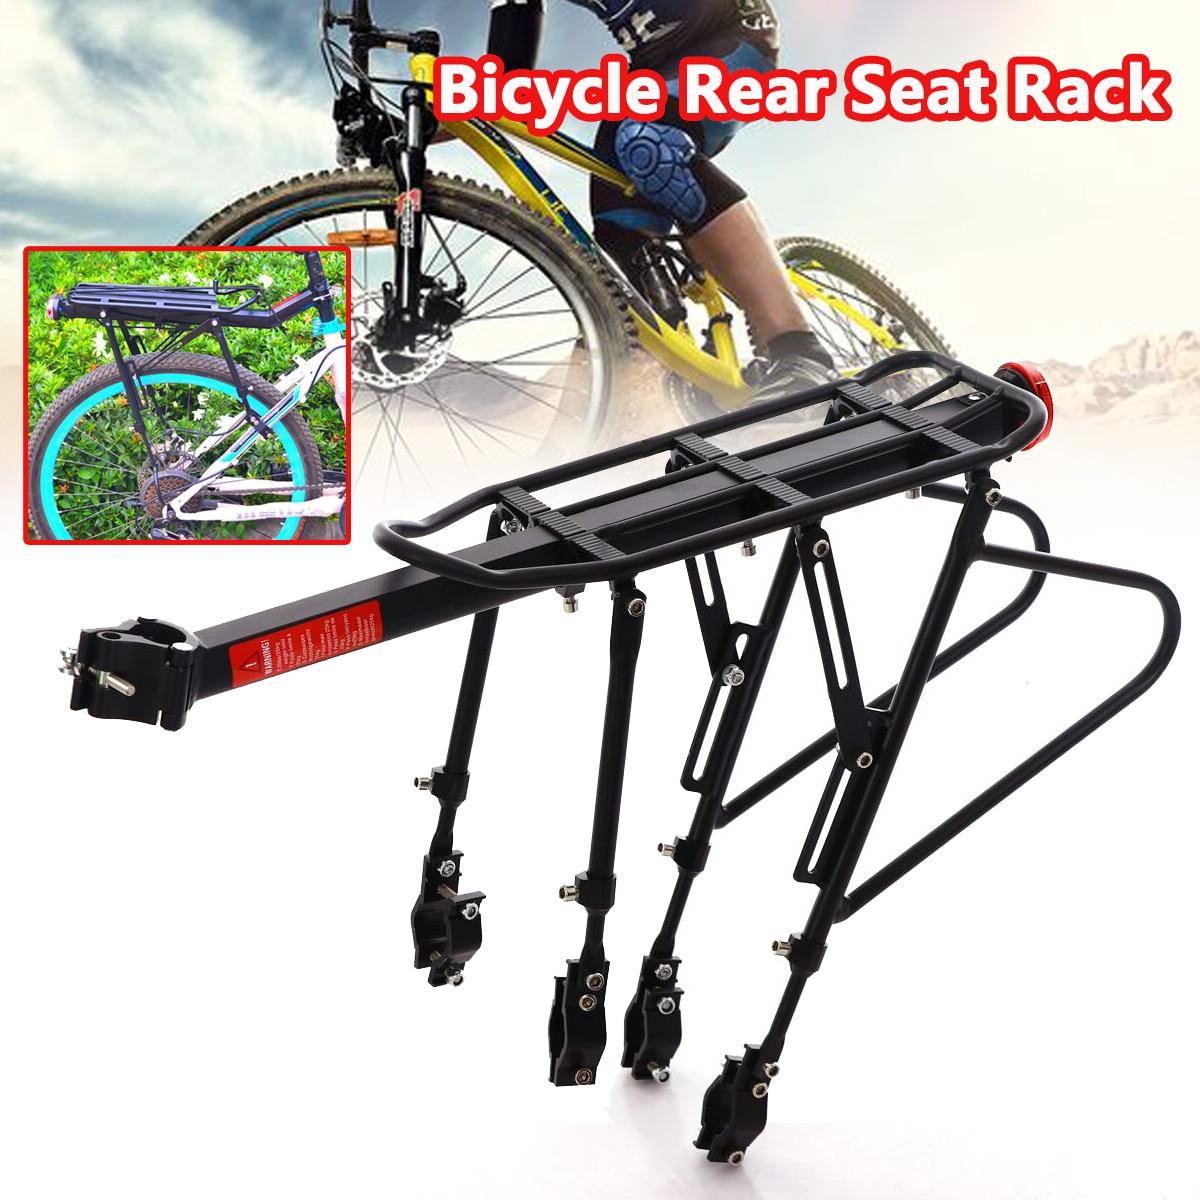 Bike Luggage Stands Aluminum Alloy Bicycle Rear Seat Luggage Shelf Adjustable Mountain Bike Carrier Bracket Bike Rear Racks Sports & Outdoors Cycling